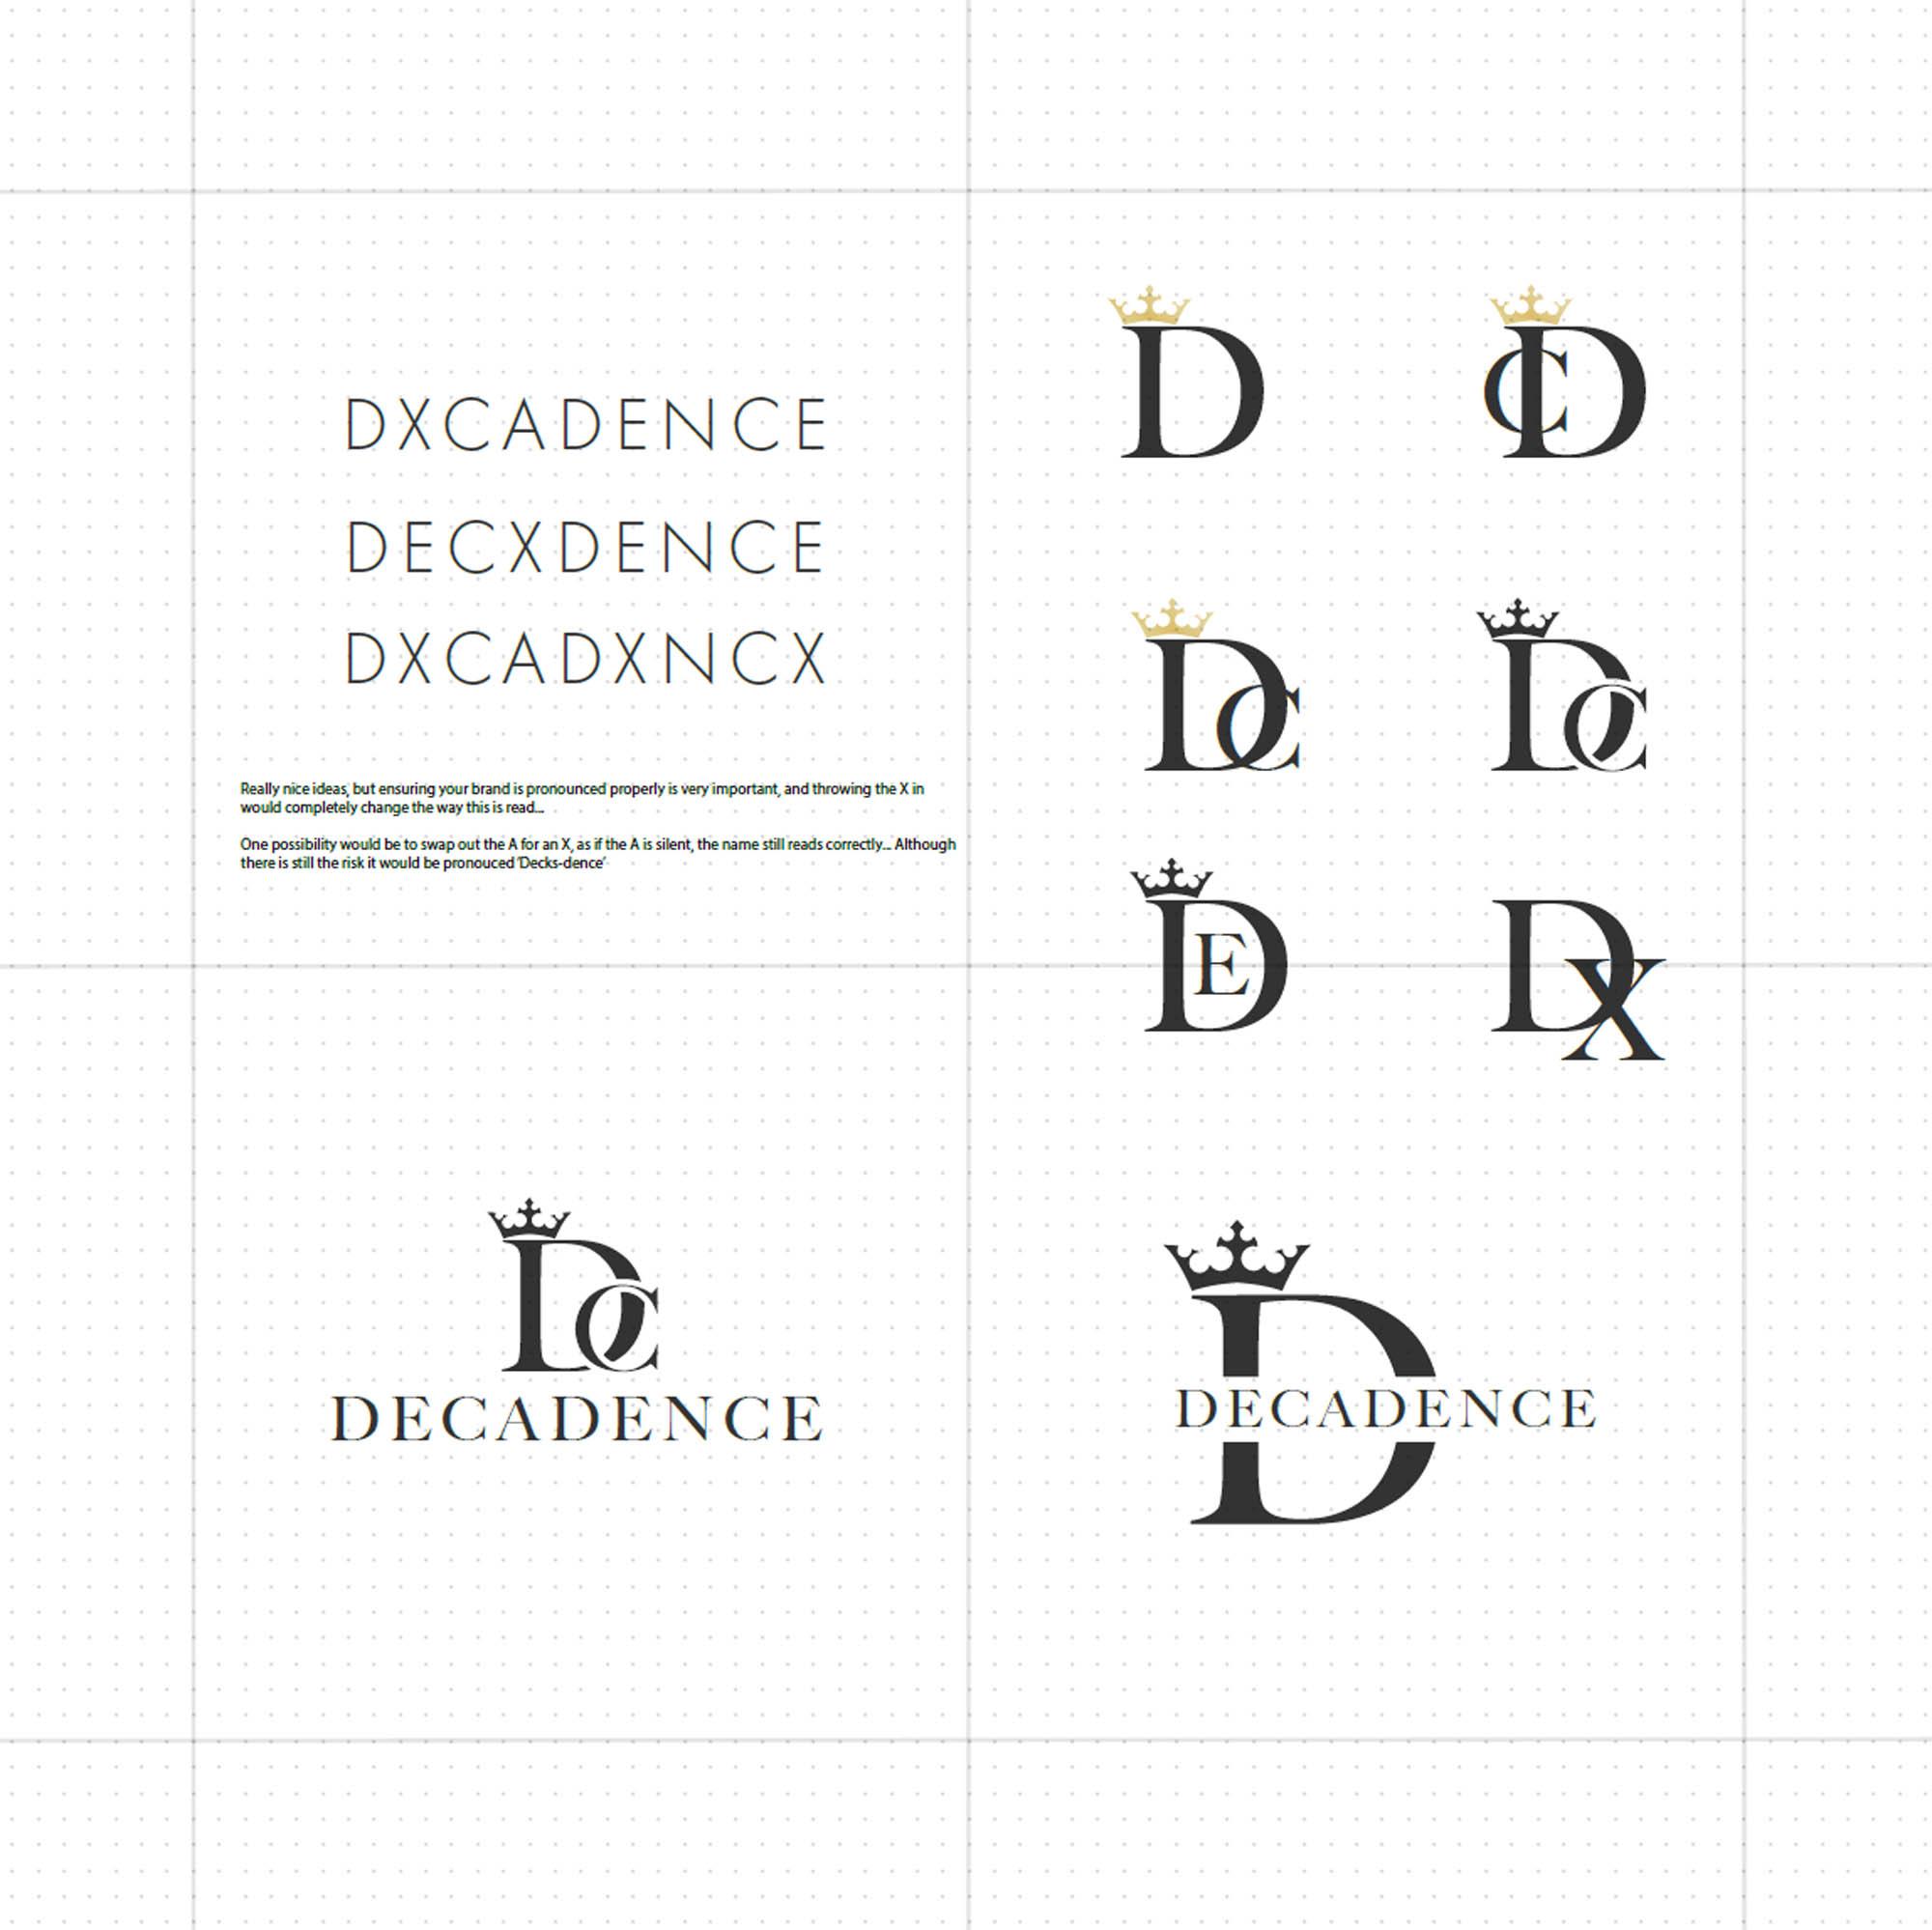 luxury-high-end-clothing-brand-logo-design-london06